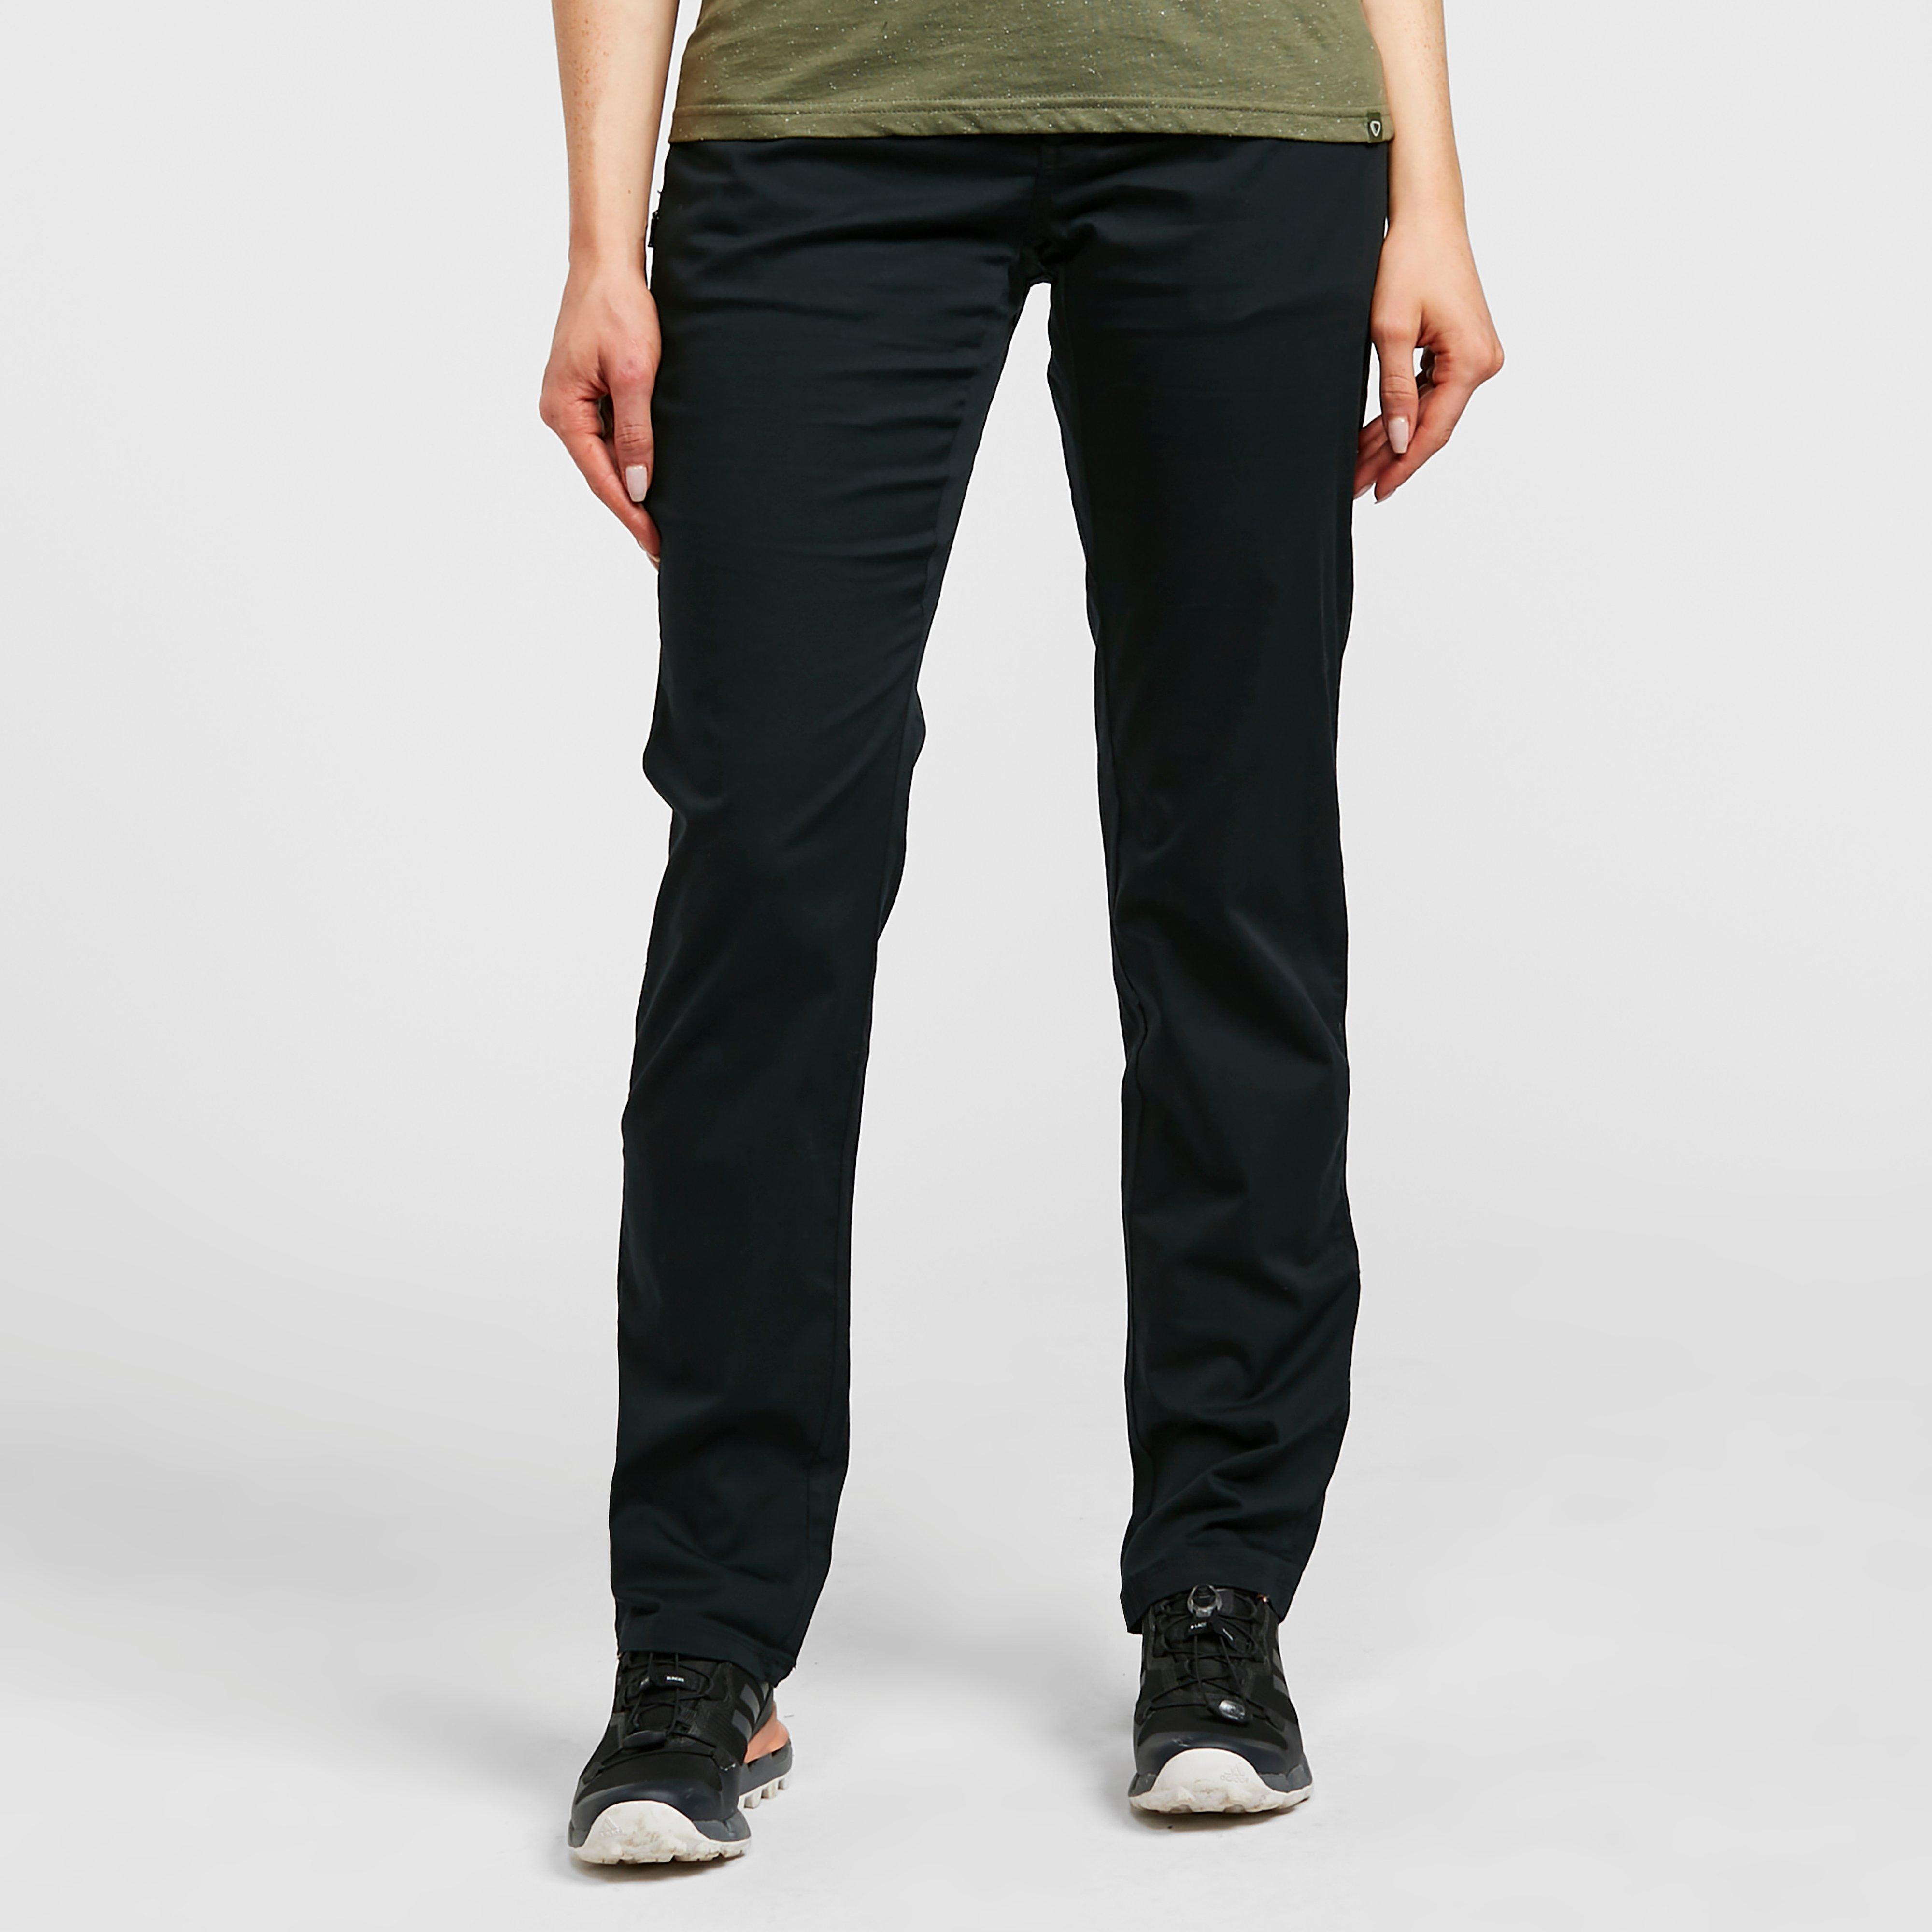 Black Diamond Radha - Black/pants  Black/pants